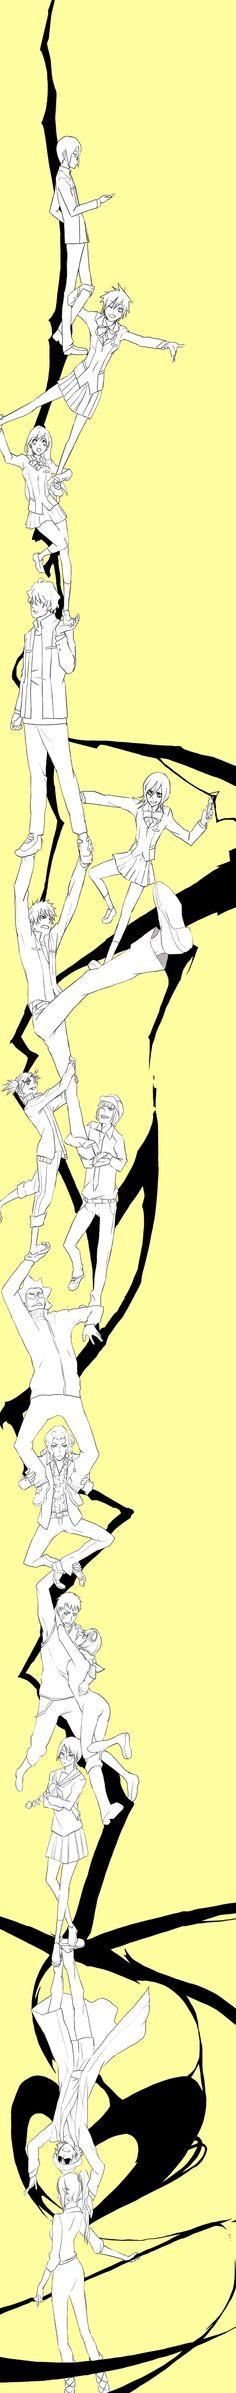 Tags: Anime, BLEACH, Kurosaki Ichigo, Kuchiki Rukia, Inoue Orihime